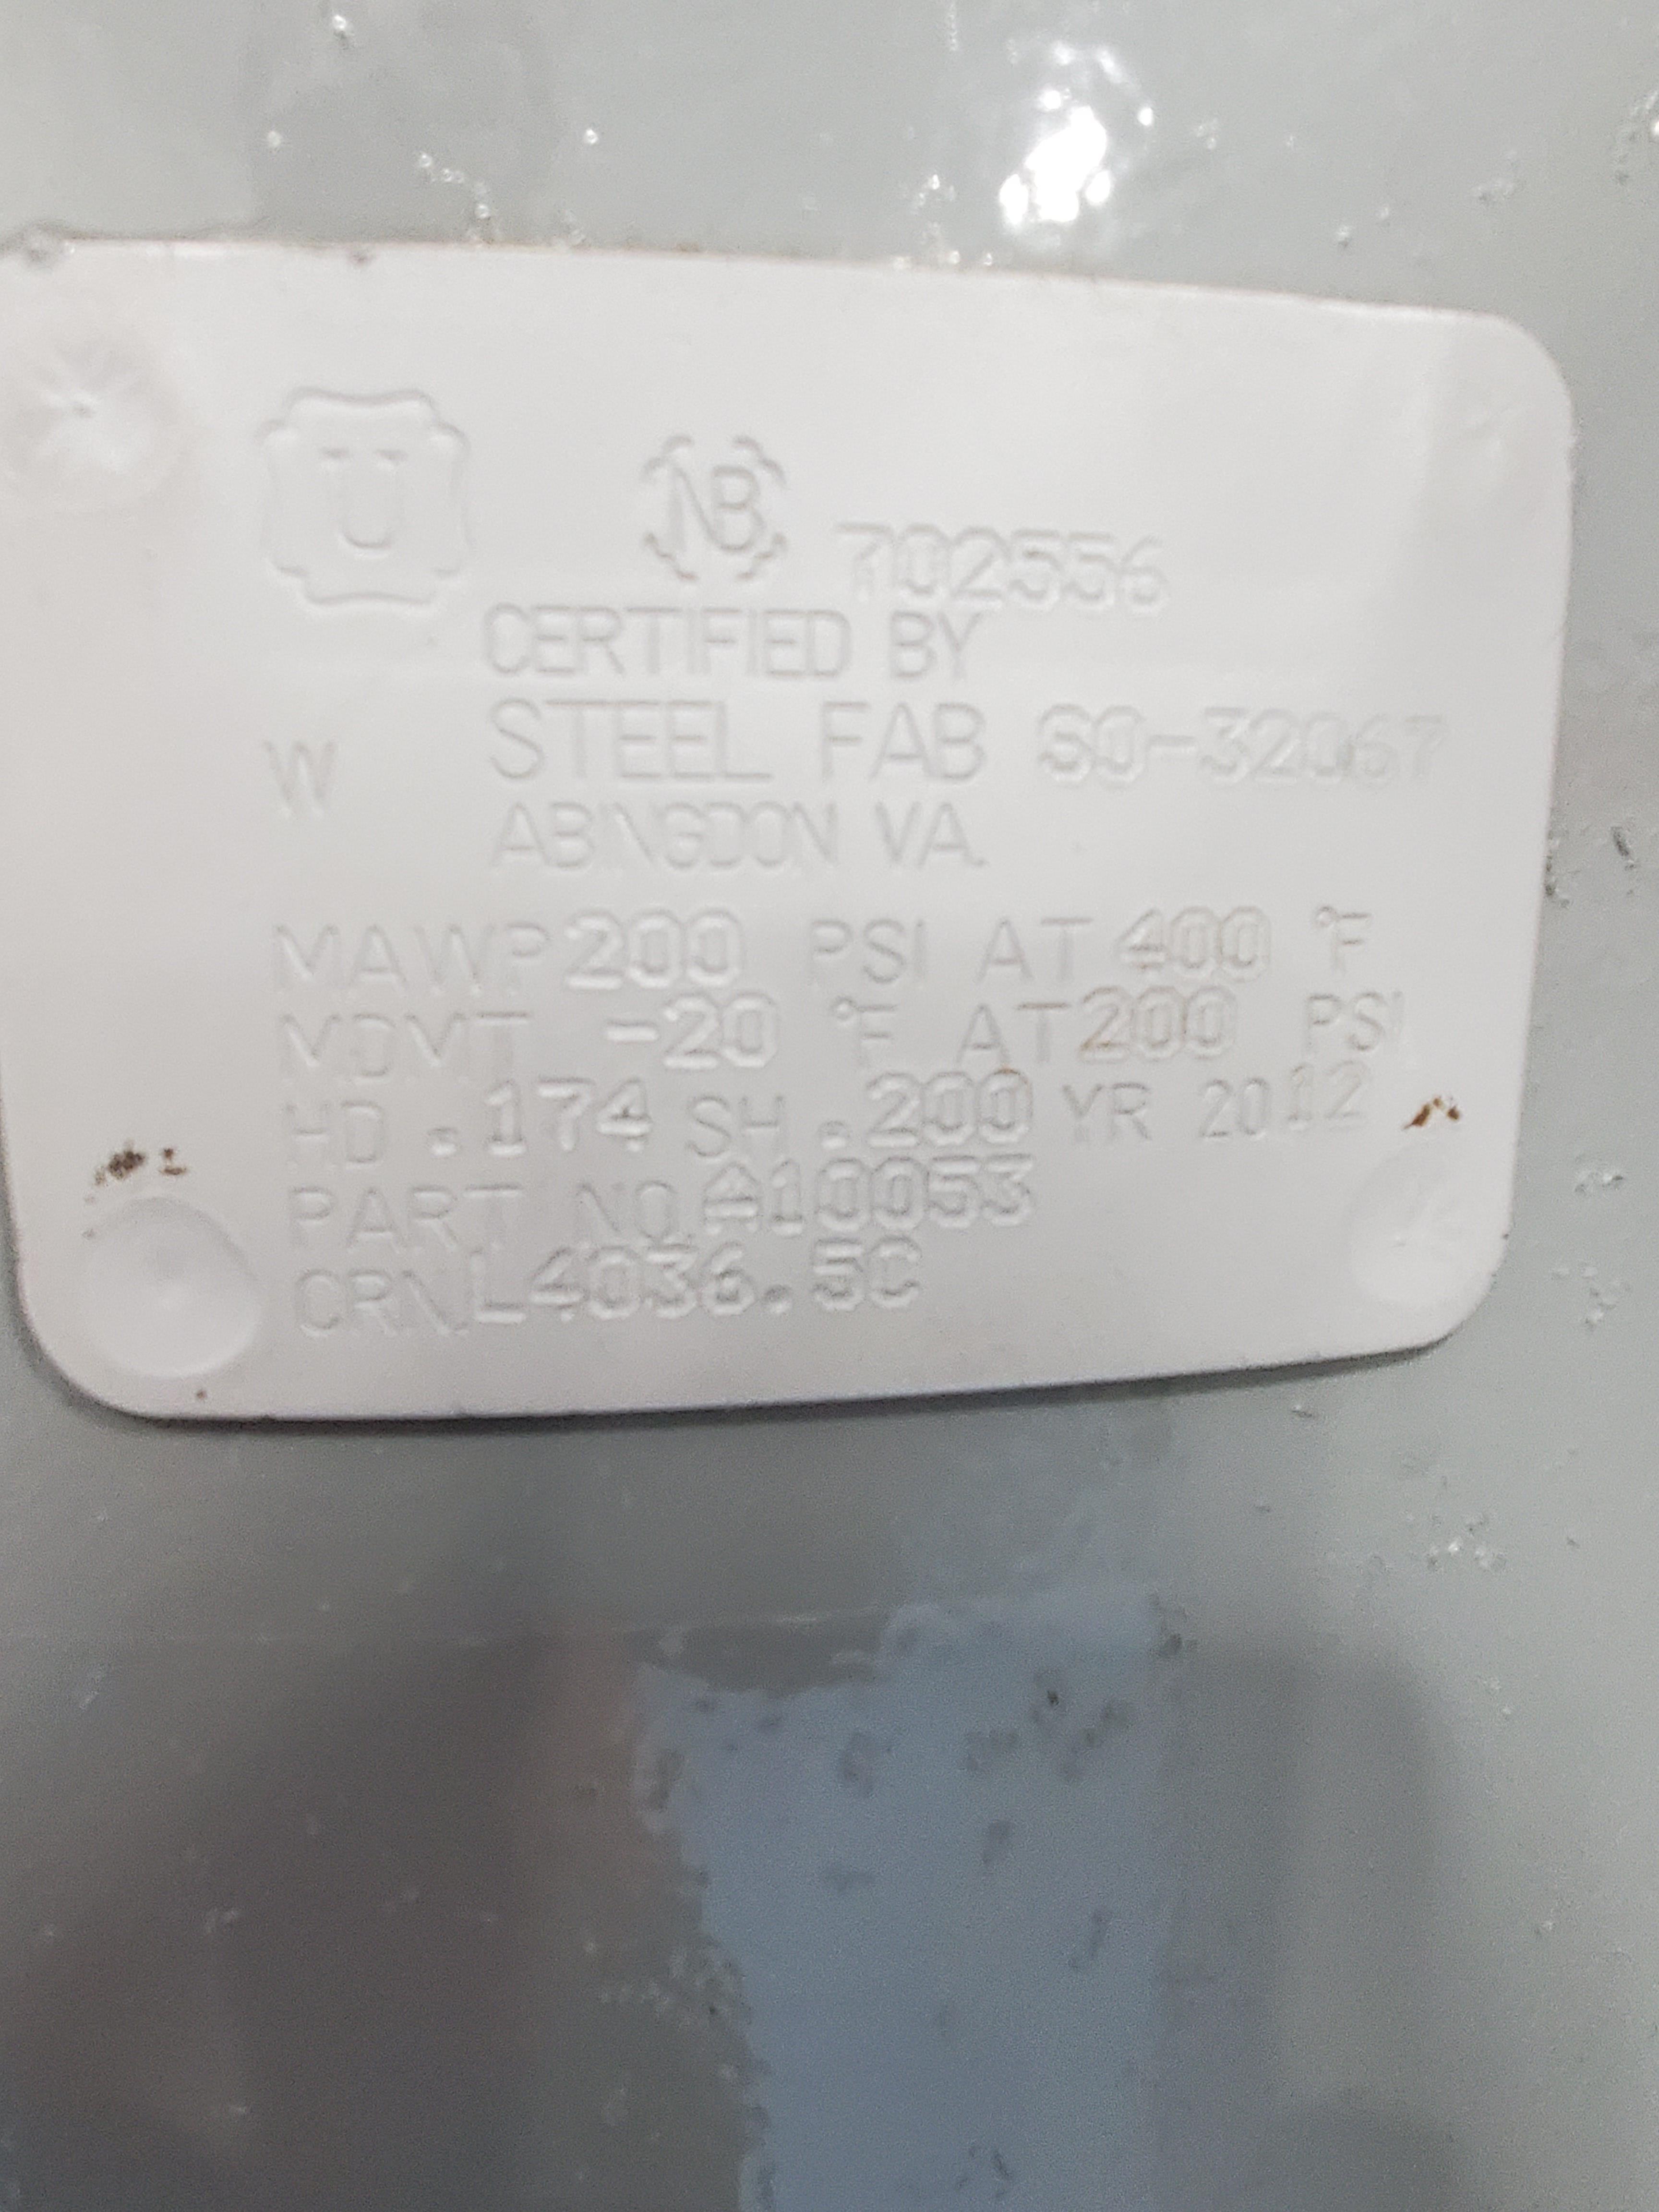 40 HP Gardner Denver CHAMPION Rotor Champ Air Compressor /w Dryer - Image 7 of 8